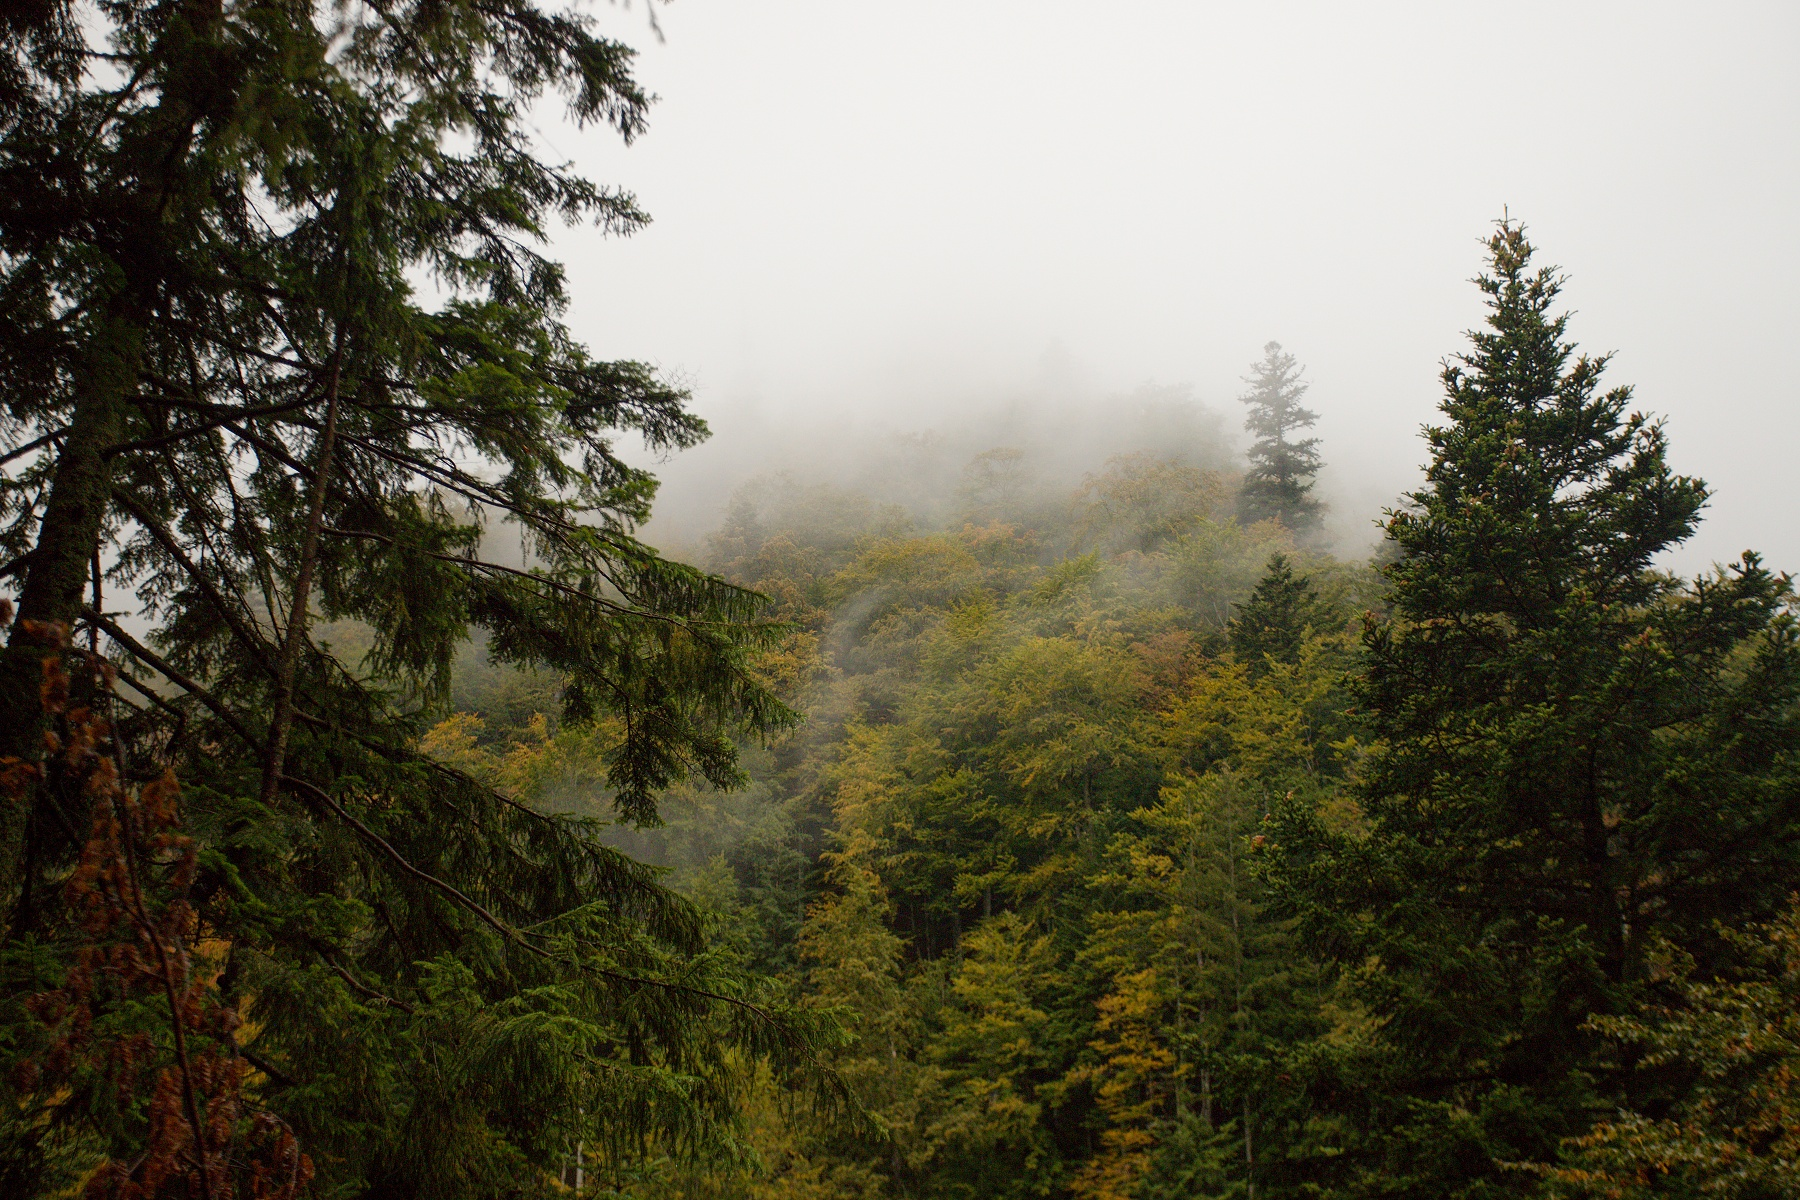 Criva valley, Munții Maramureșului, Romania Canon EOS 6d mark II + Canon 17-40mm, 40mm, 1/2000, f4, ISO 1000, 29. september 2020